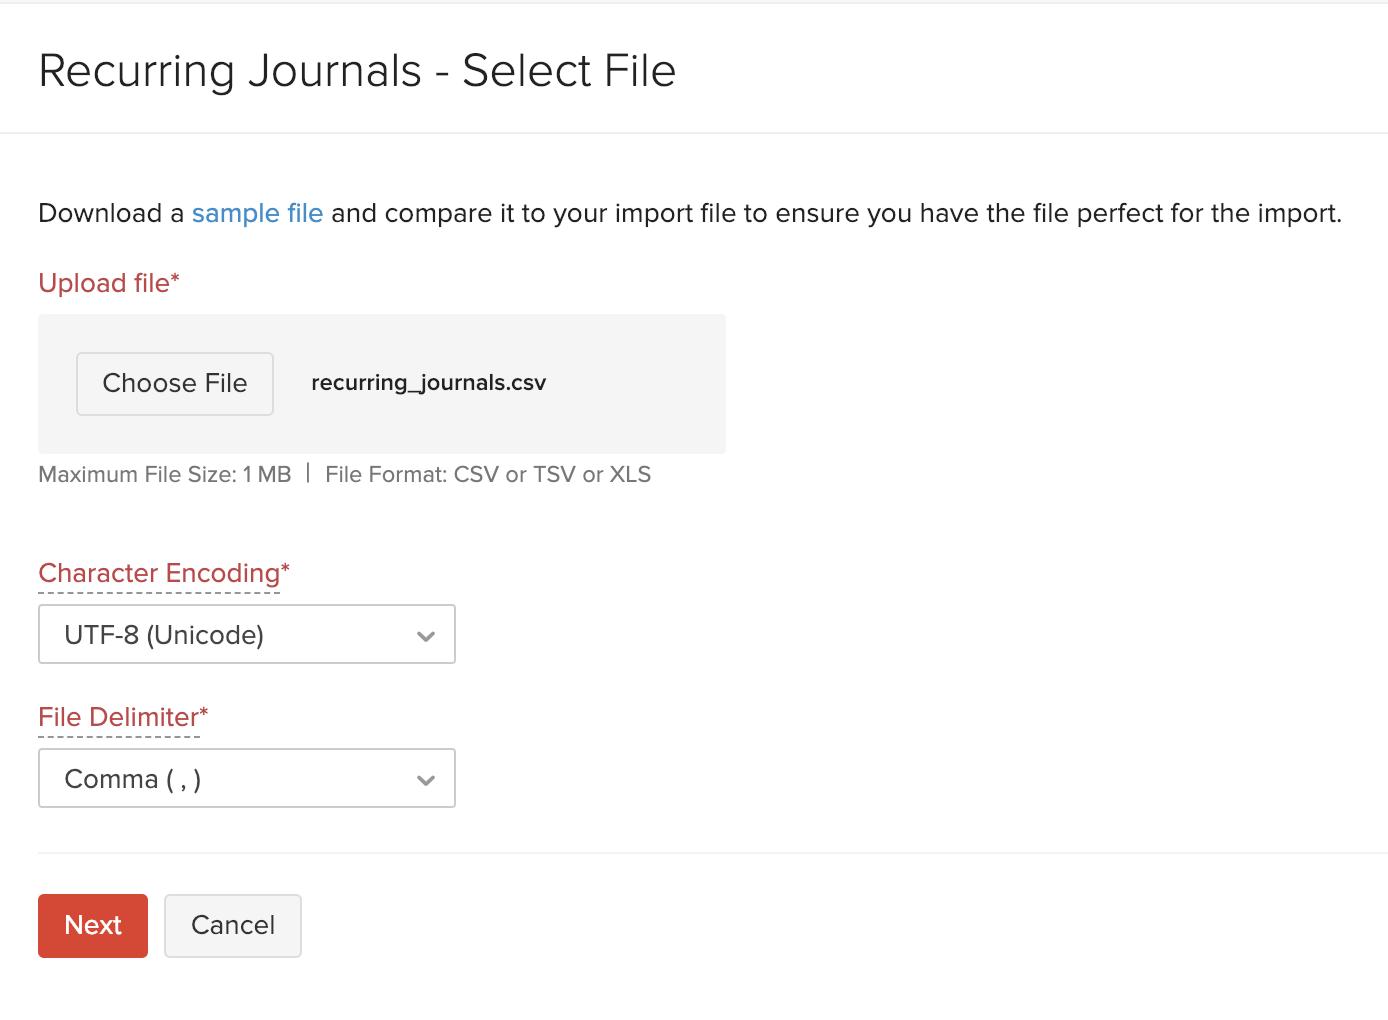 Import Recurring Journals - Choose File